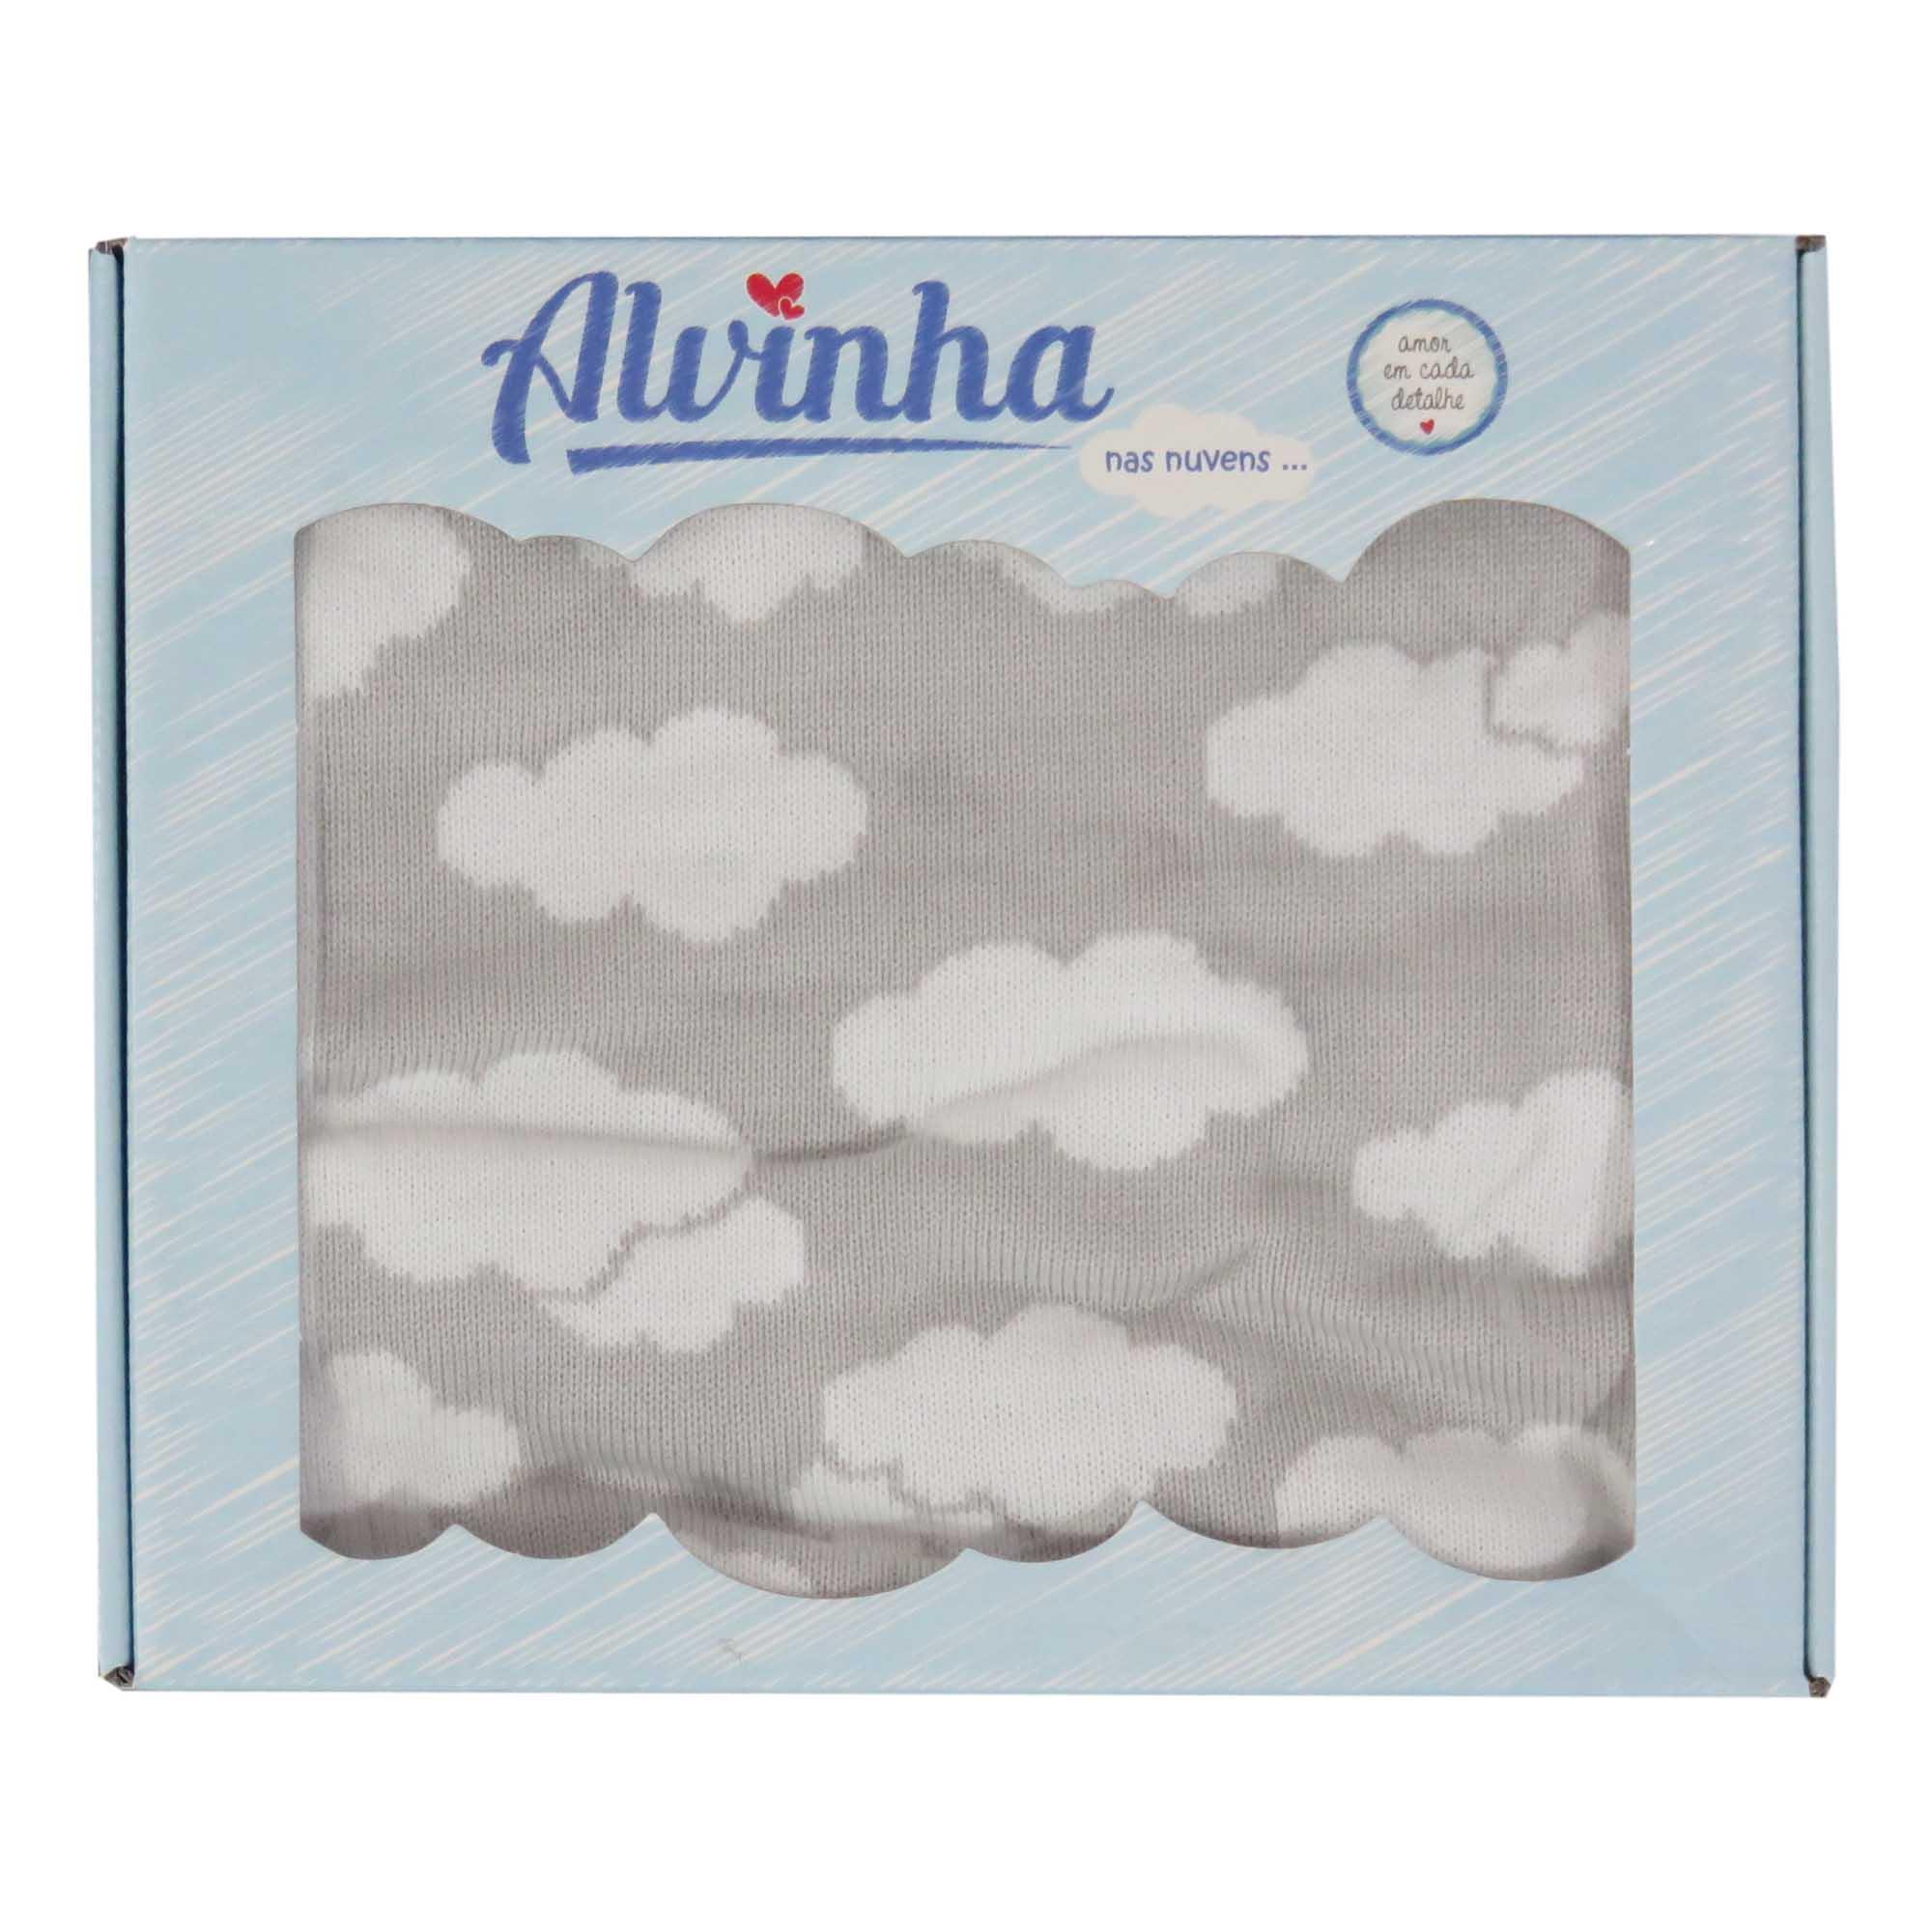 Manta Tricot Estampada Nuvens - Minasrey - Alvinha